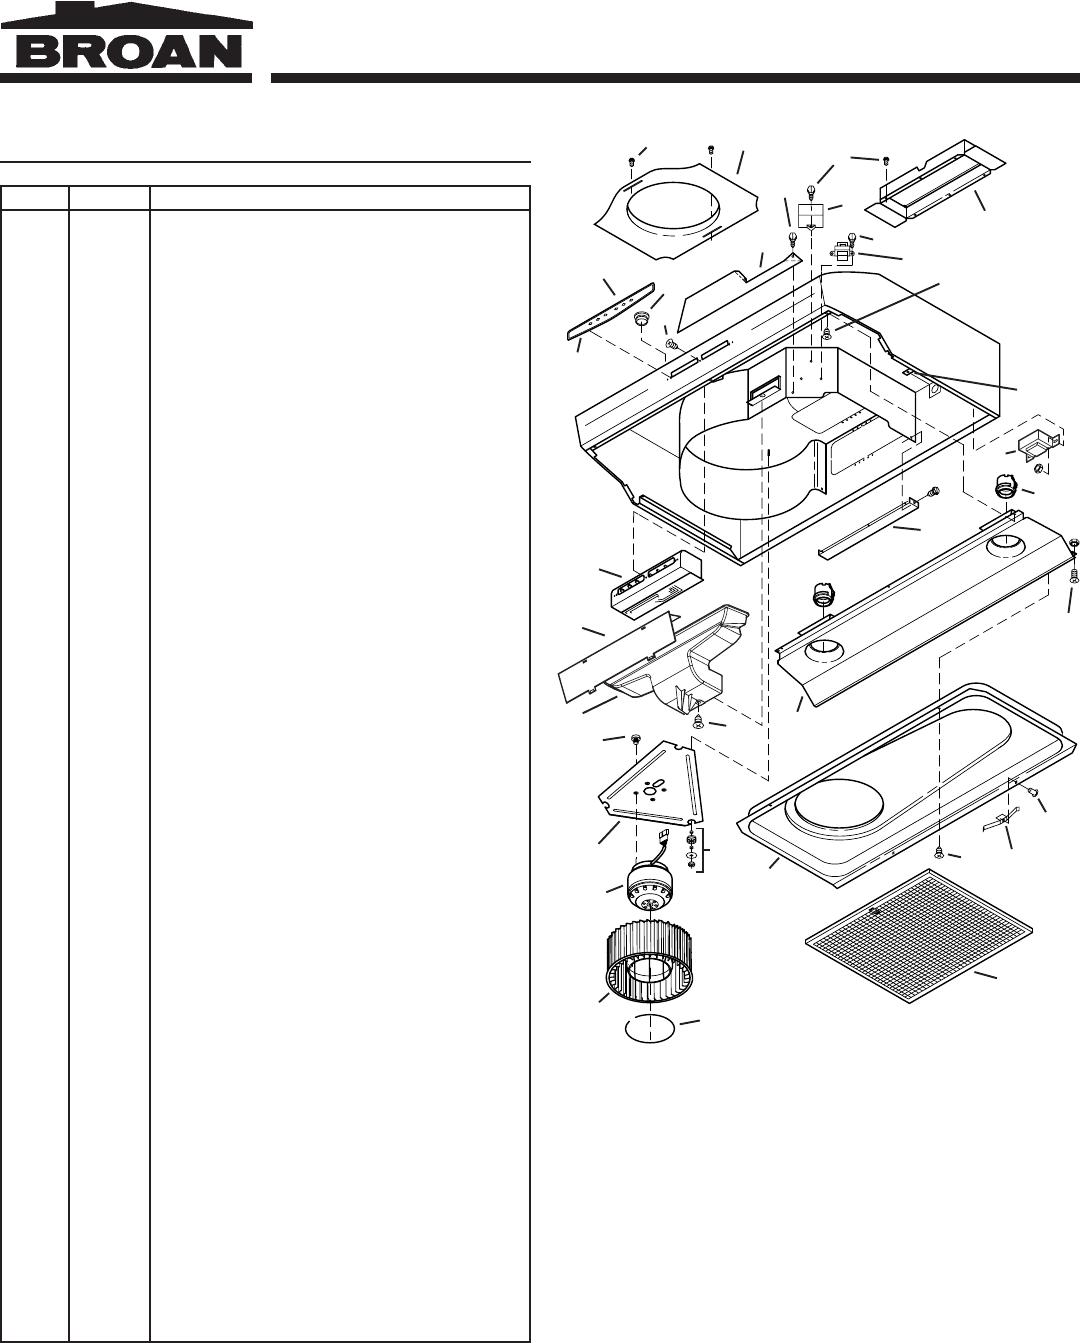 Broan Qs3 Service Parts Allure Range Hood Wiring Diagram